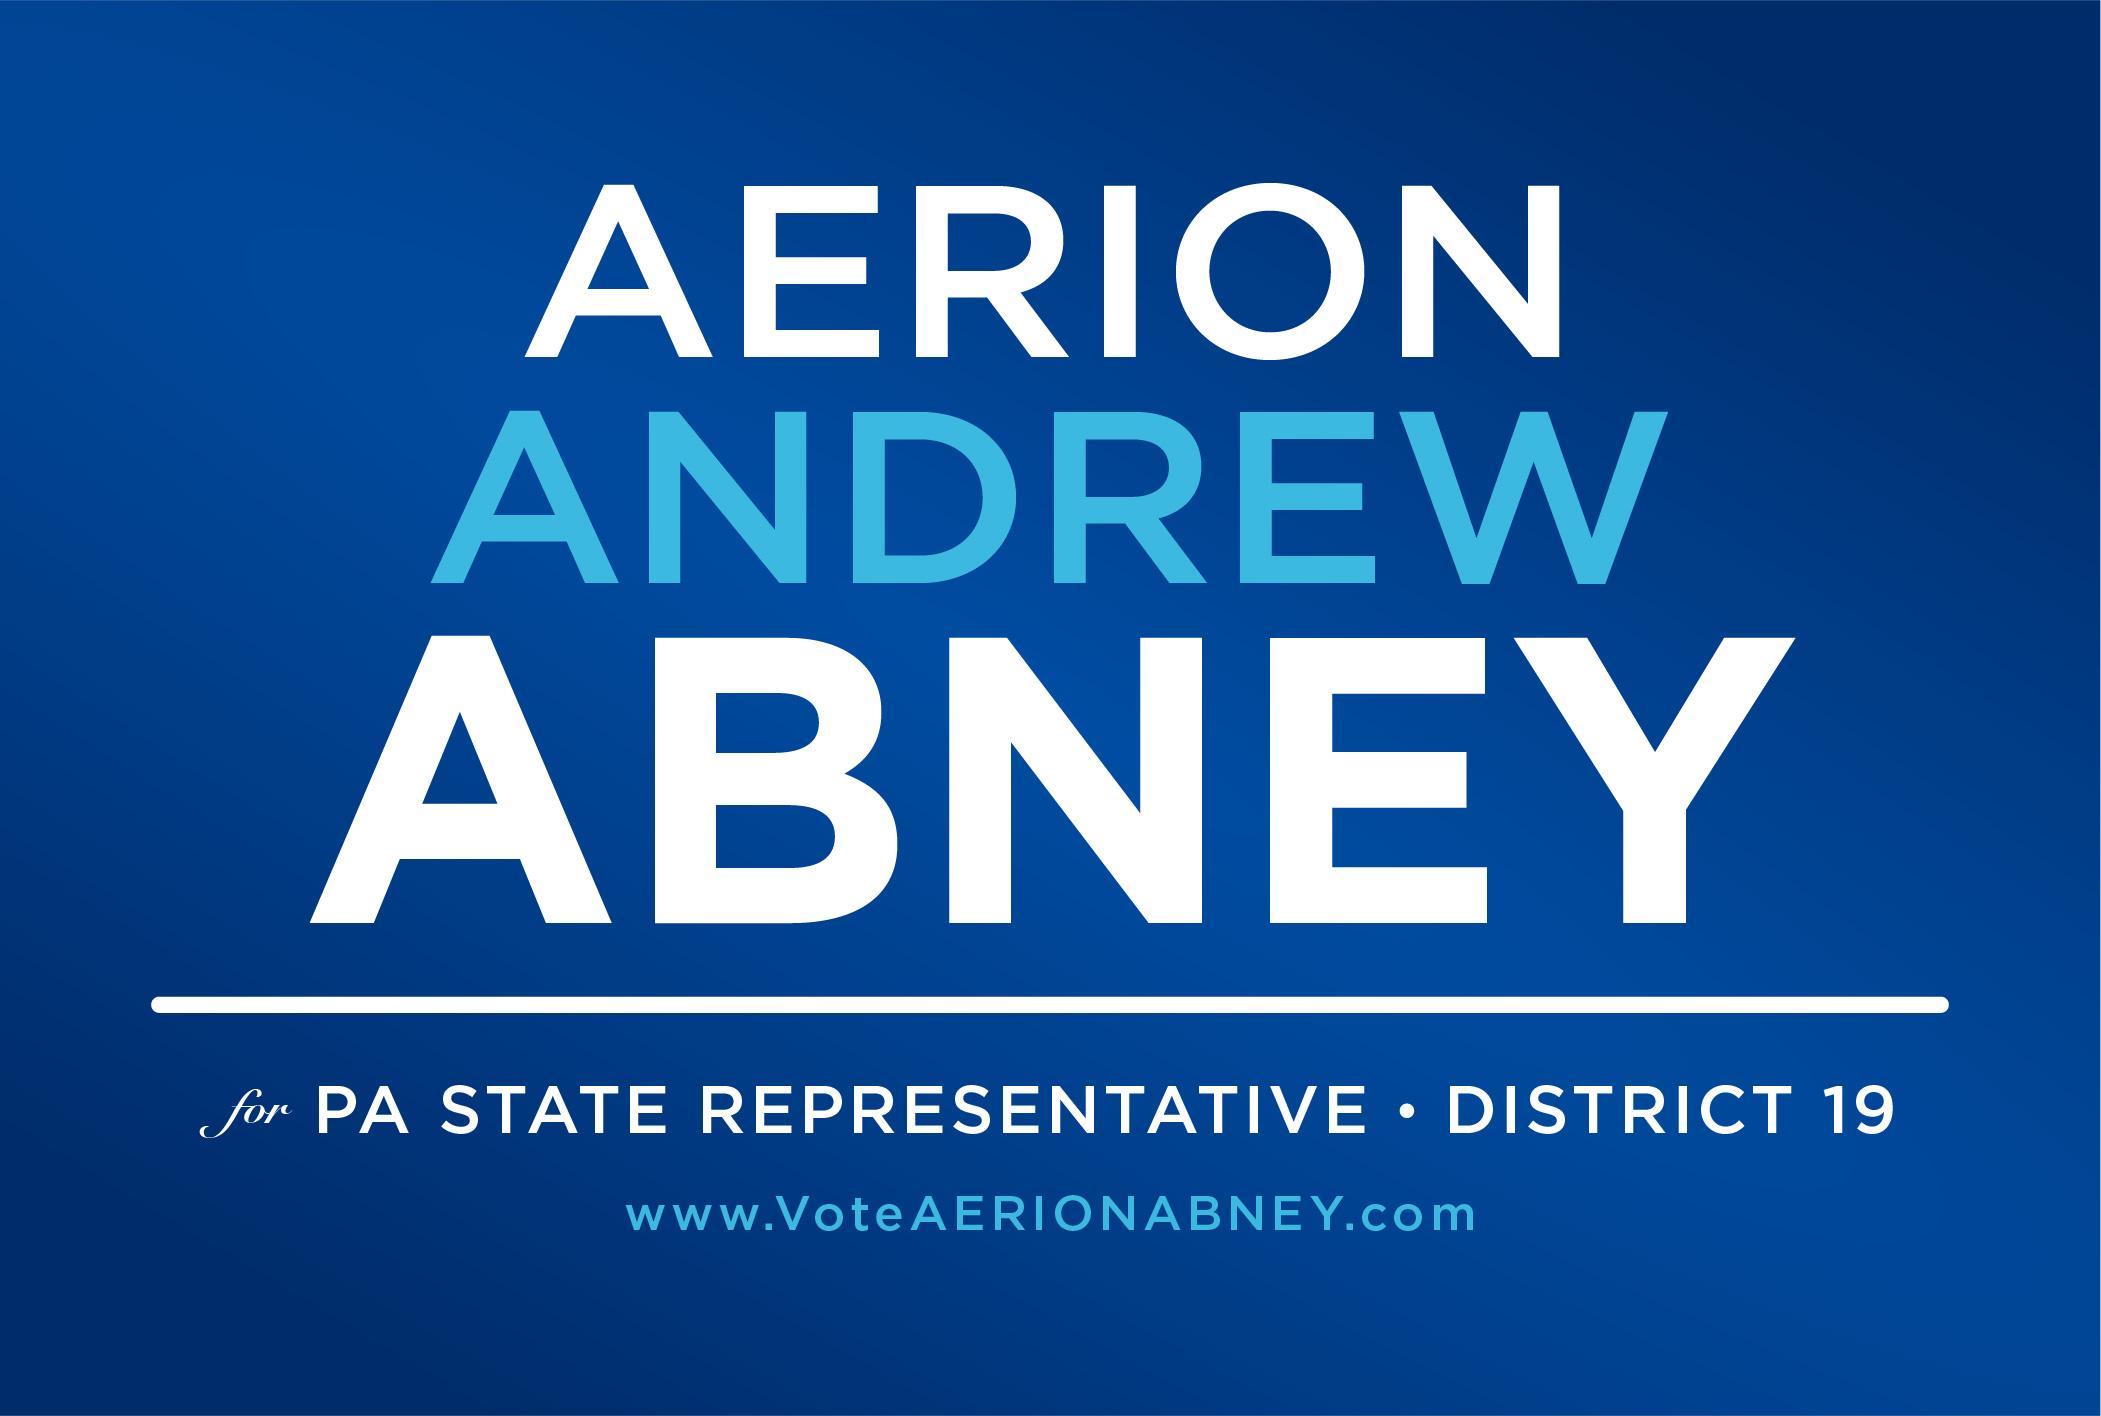 Aerion Abney